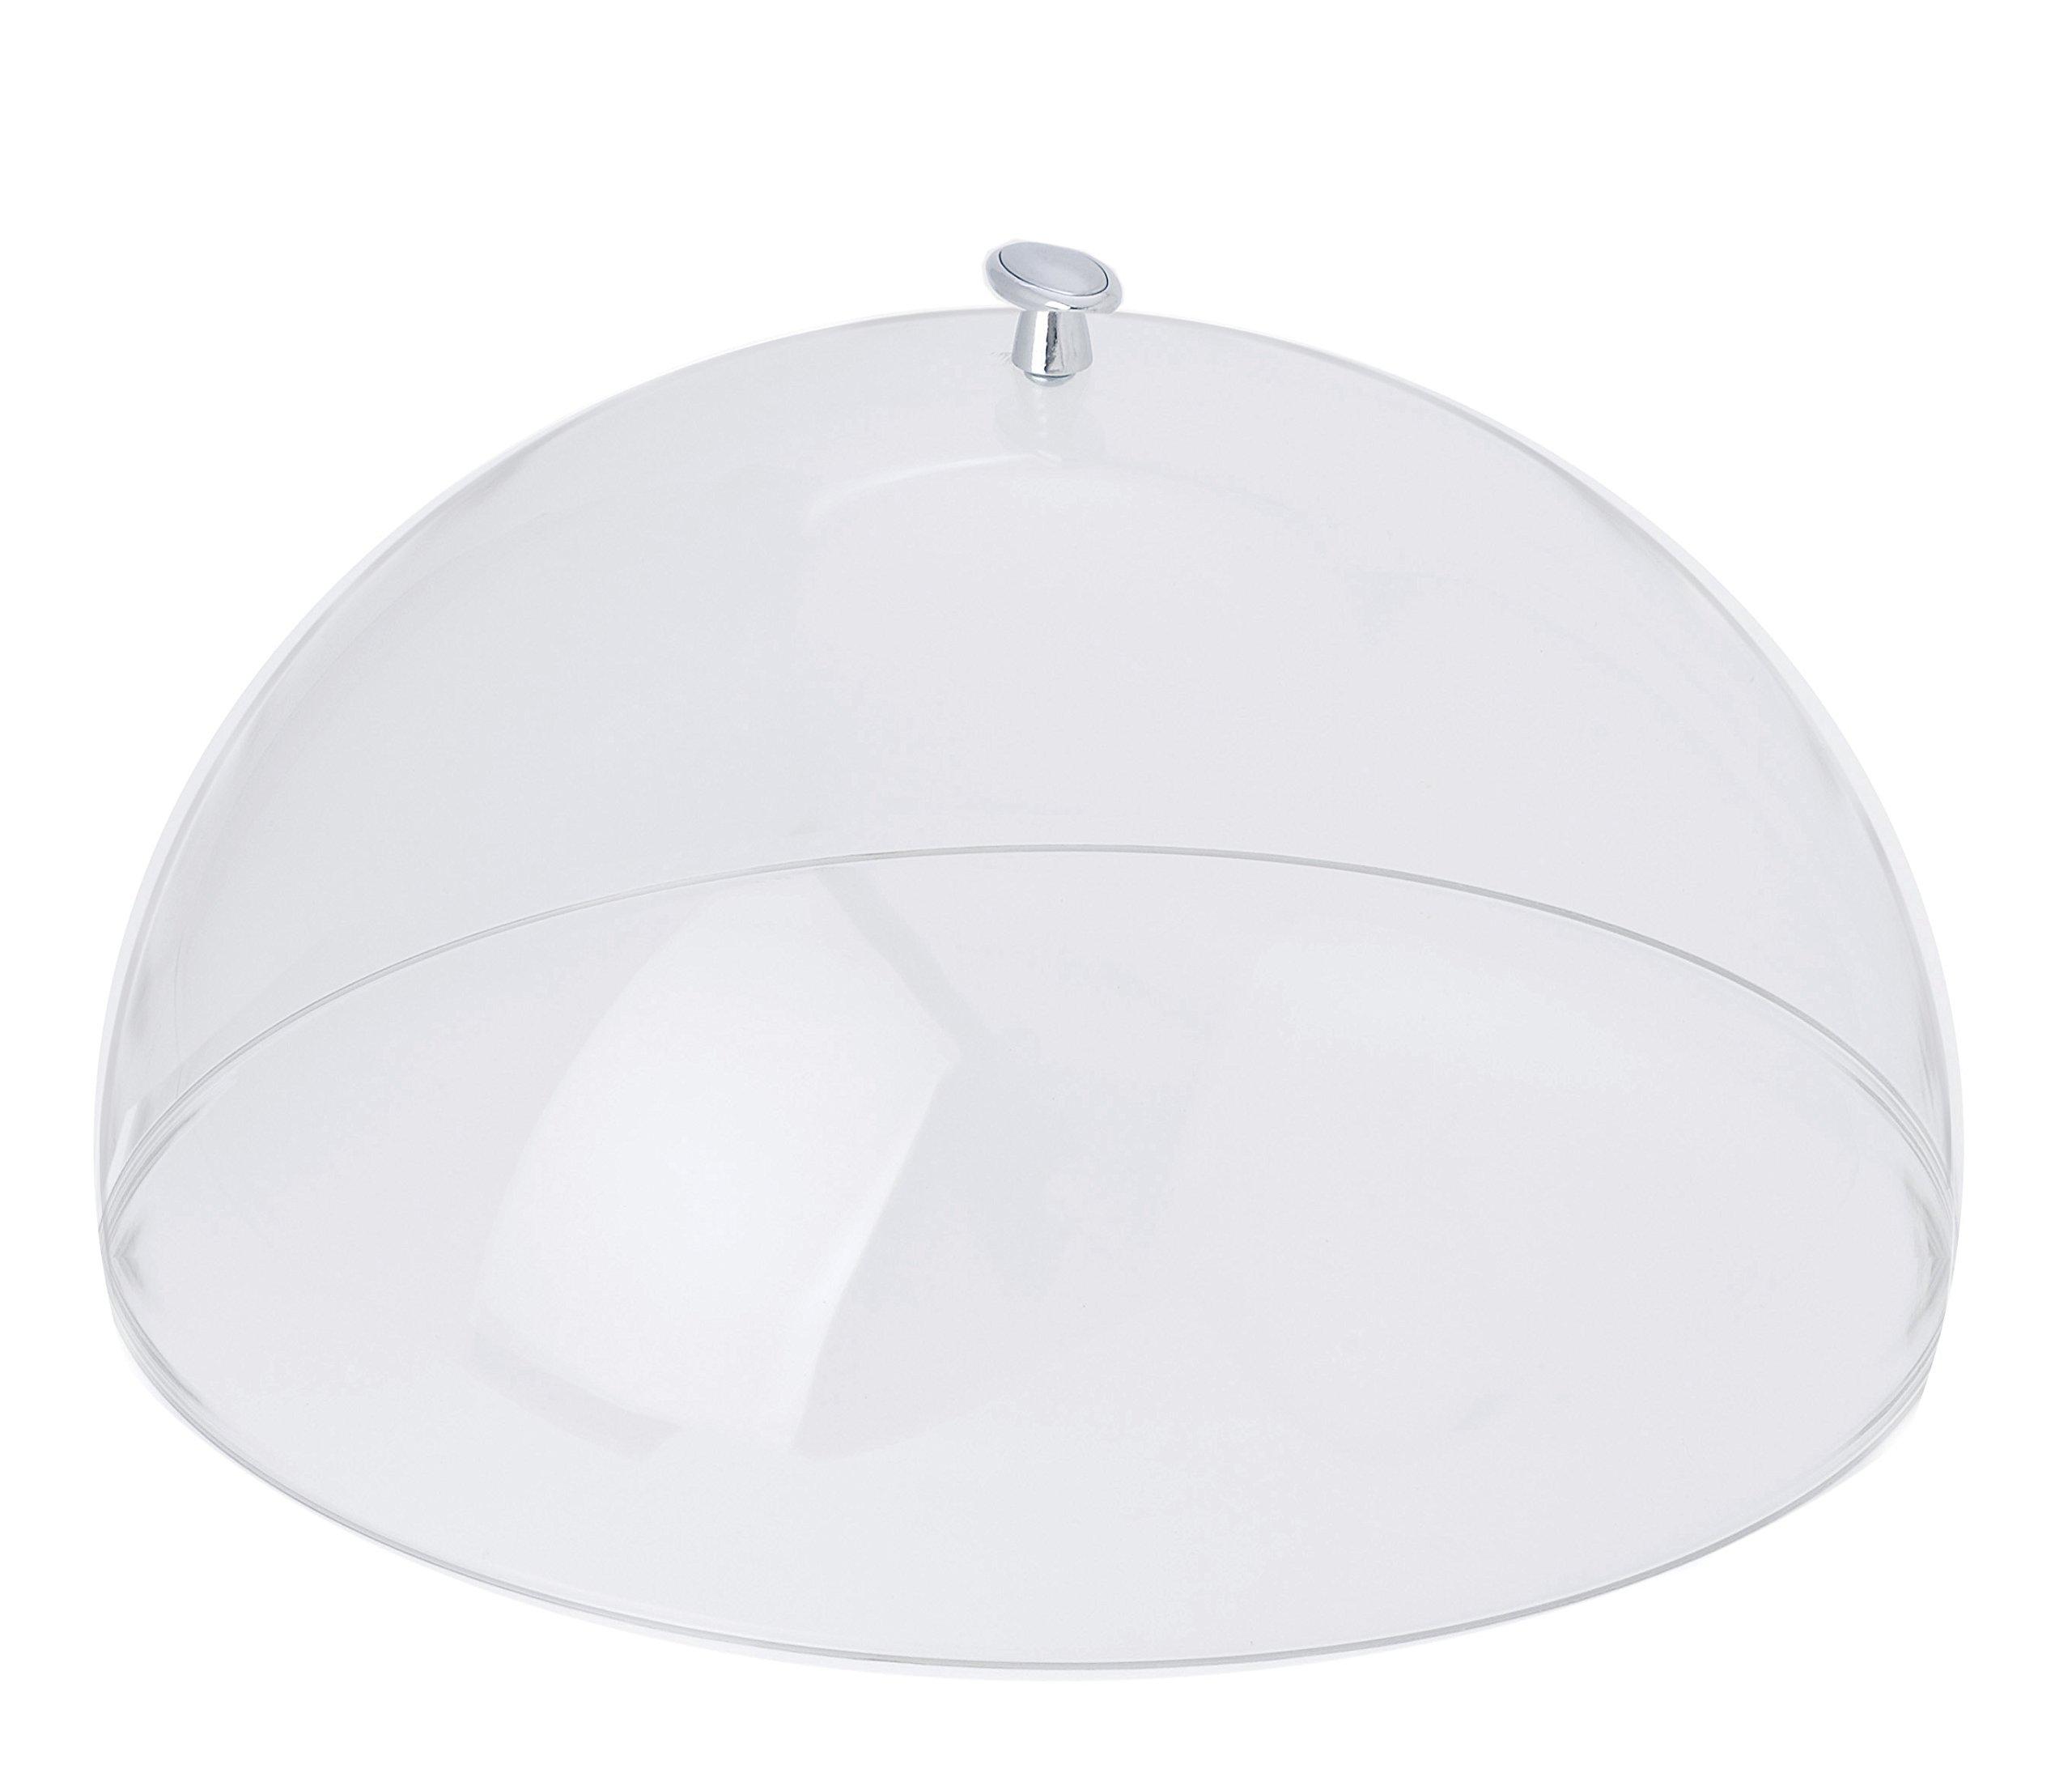 Cuisinox Acrylic Dome, 30cm, Transparent